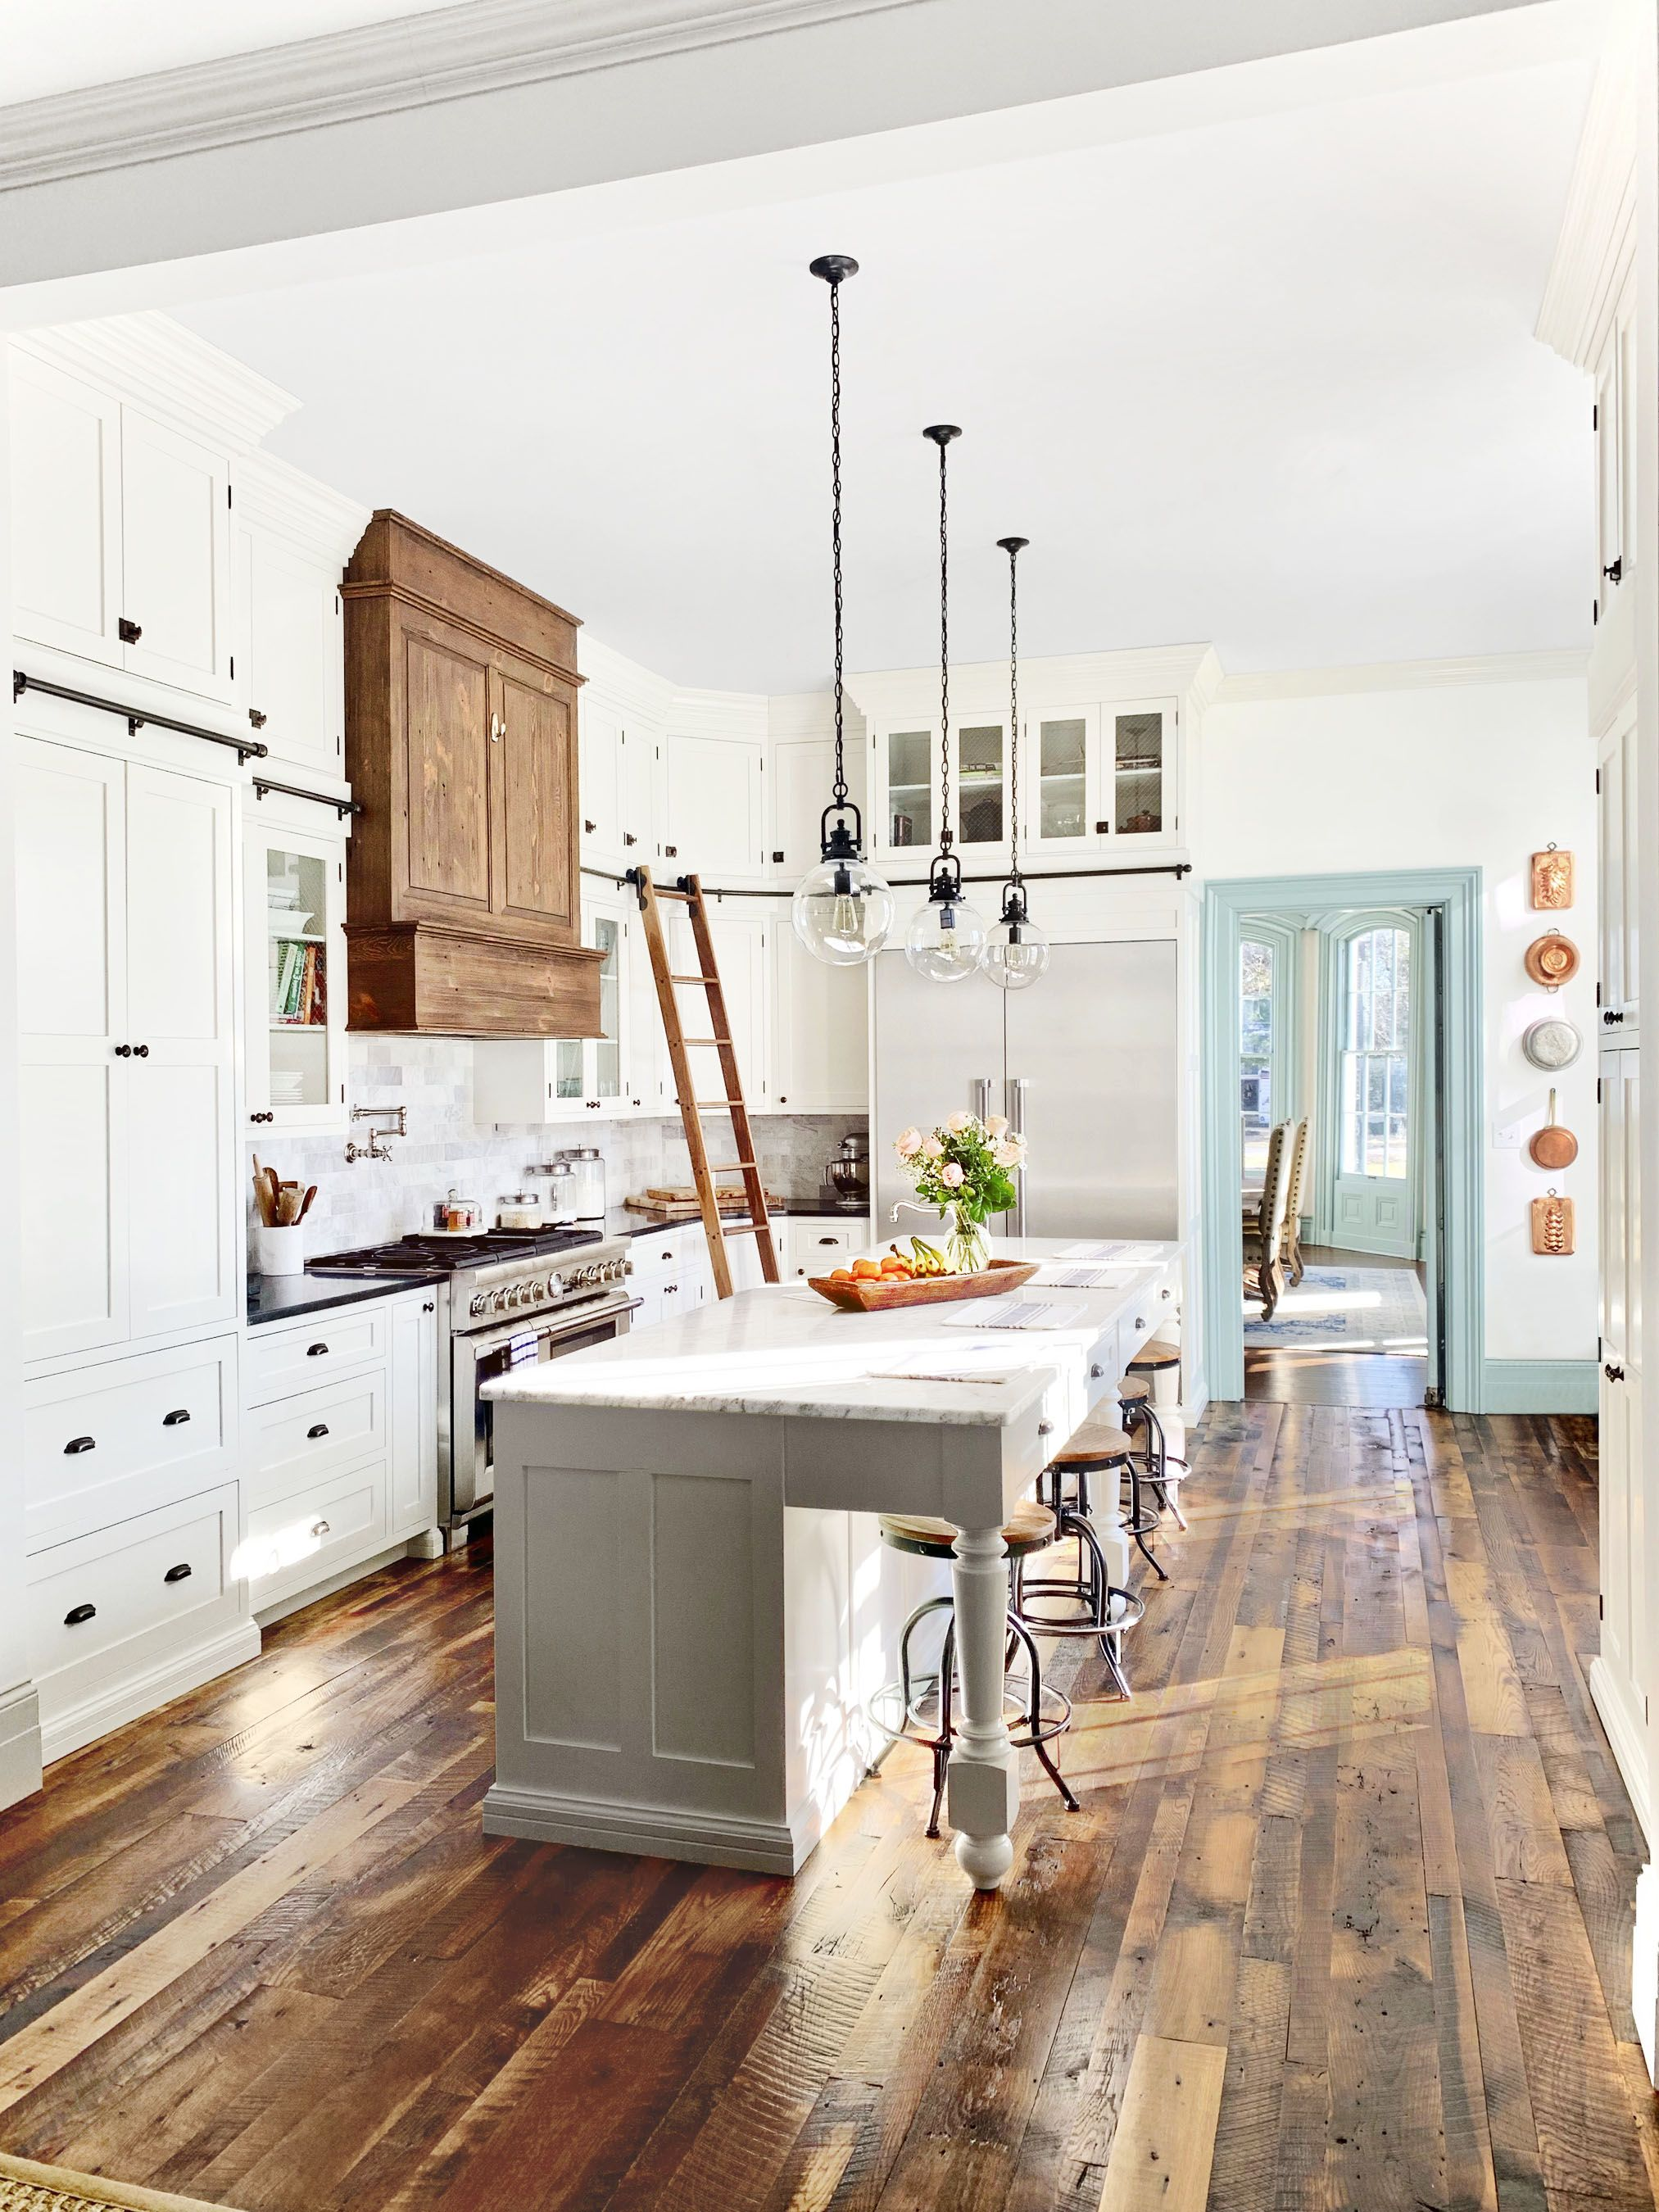 9 Farmhouse Style Kitchens   Rustic Decor Ideas for Kitchens